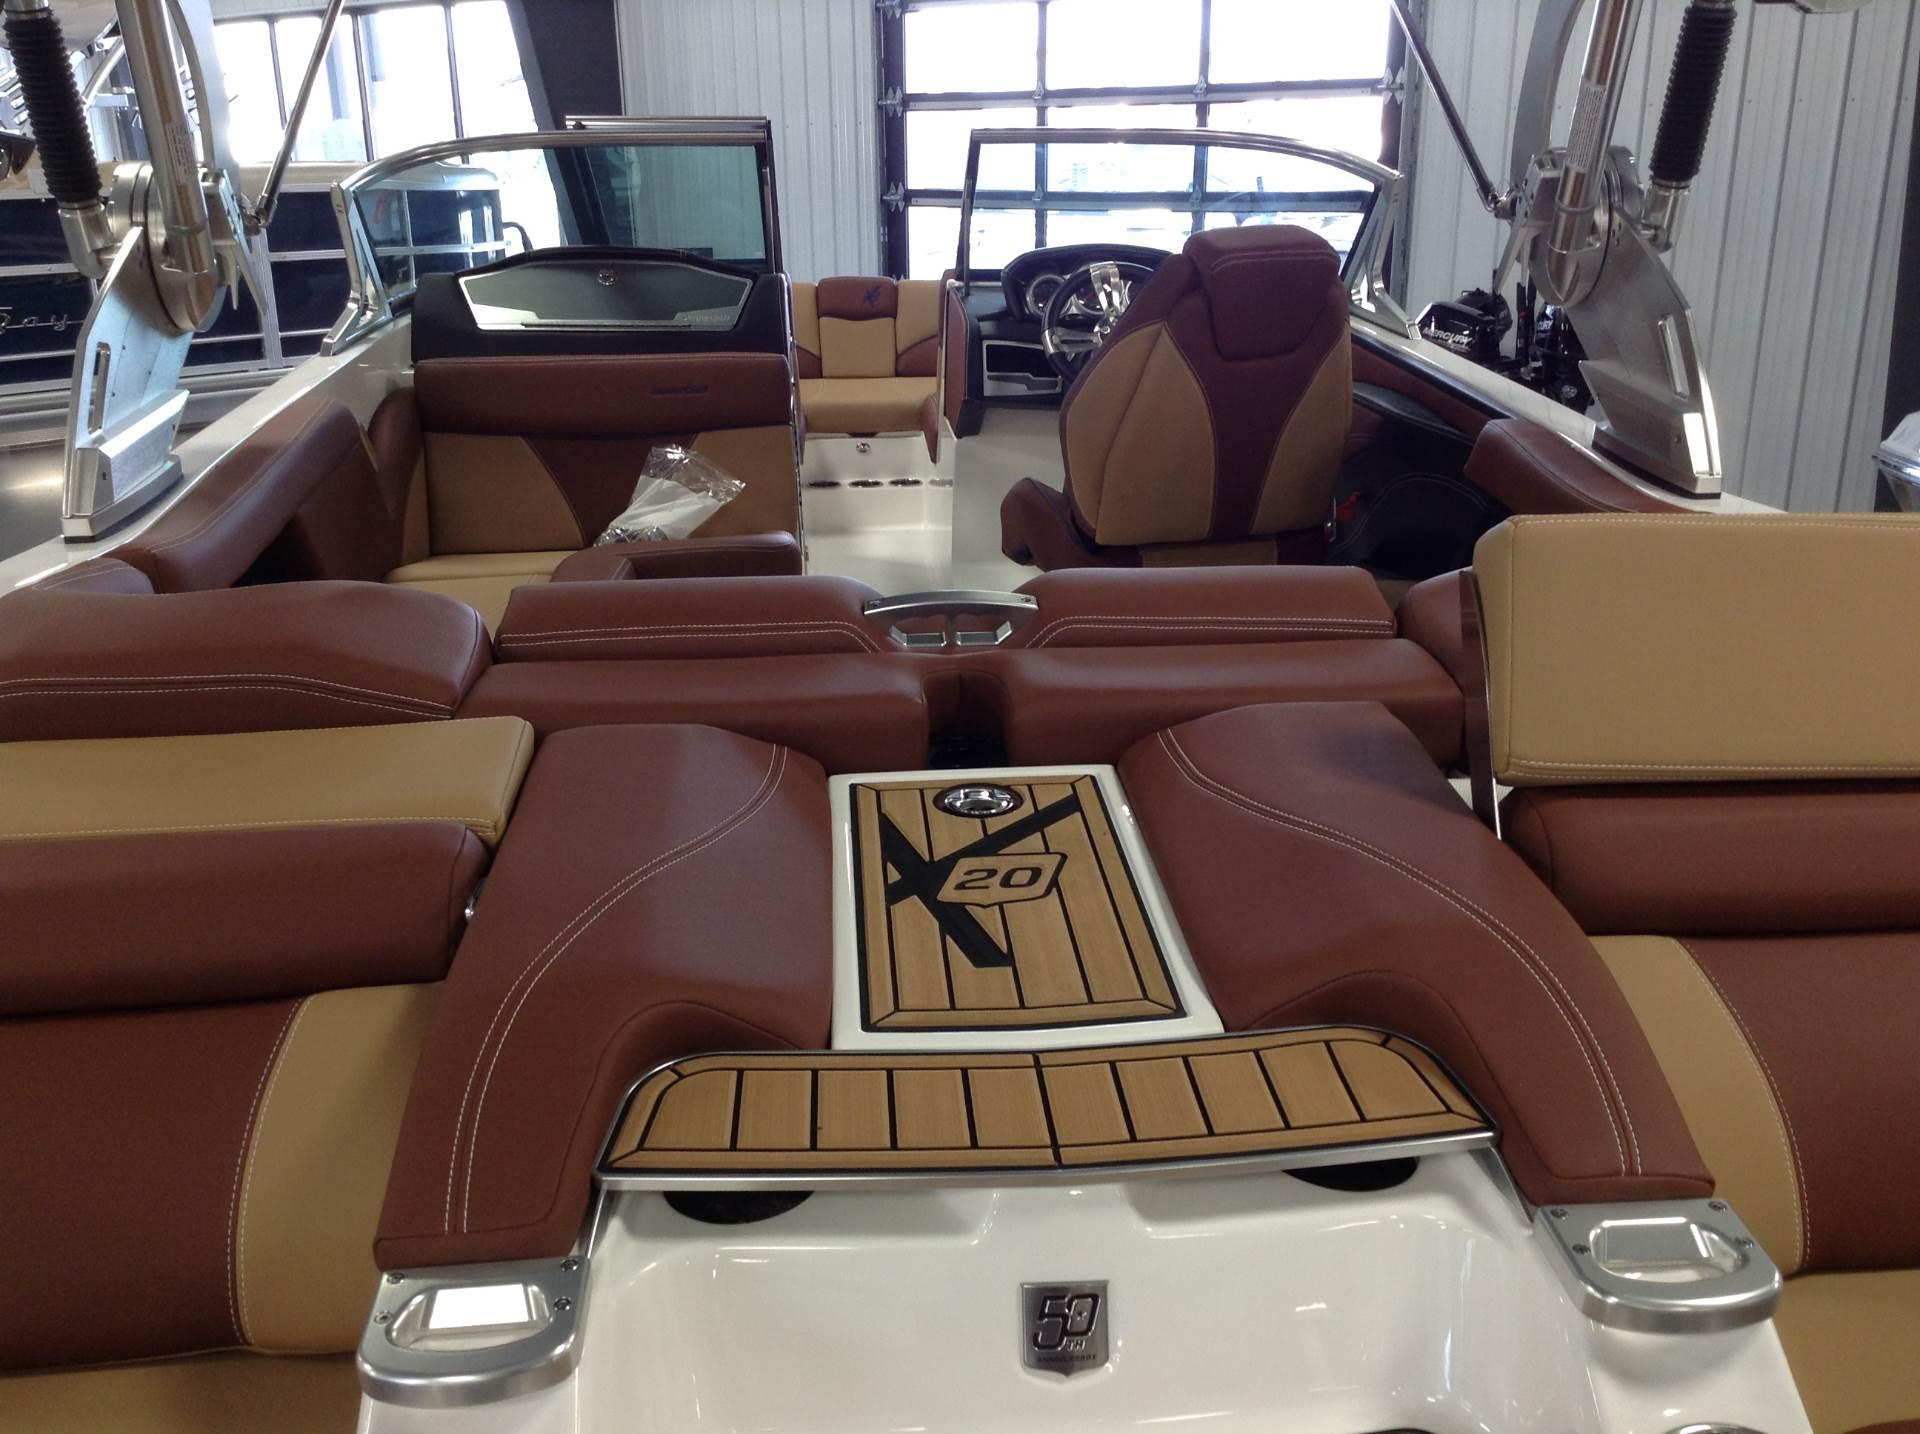 2018 20 Foot MasterCraft X20 For Sale at Captain's Marine in Kalispell Montana Best WakeSurf Boat